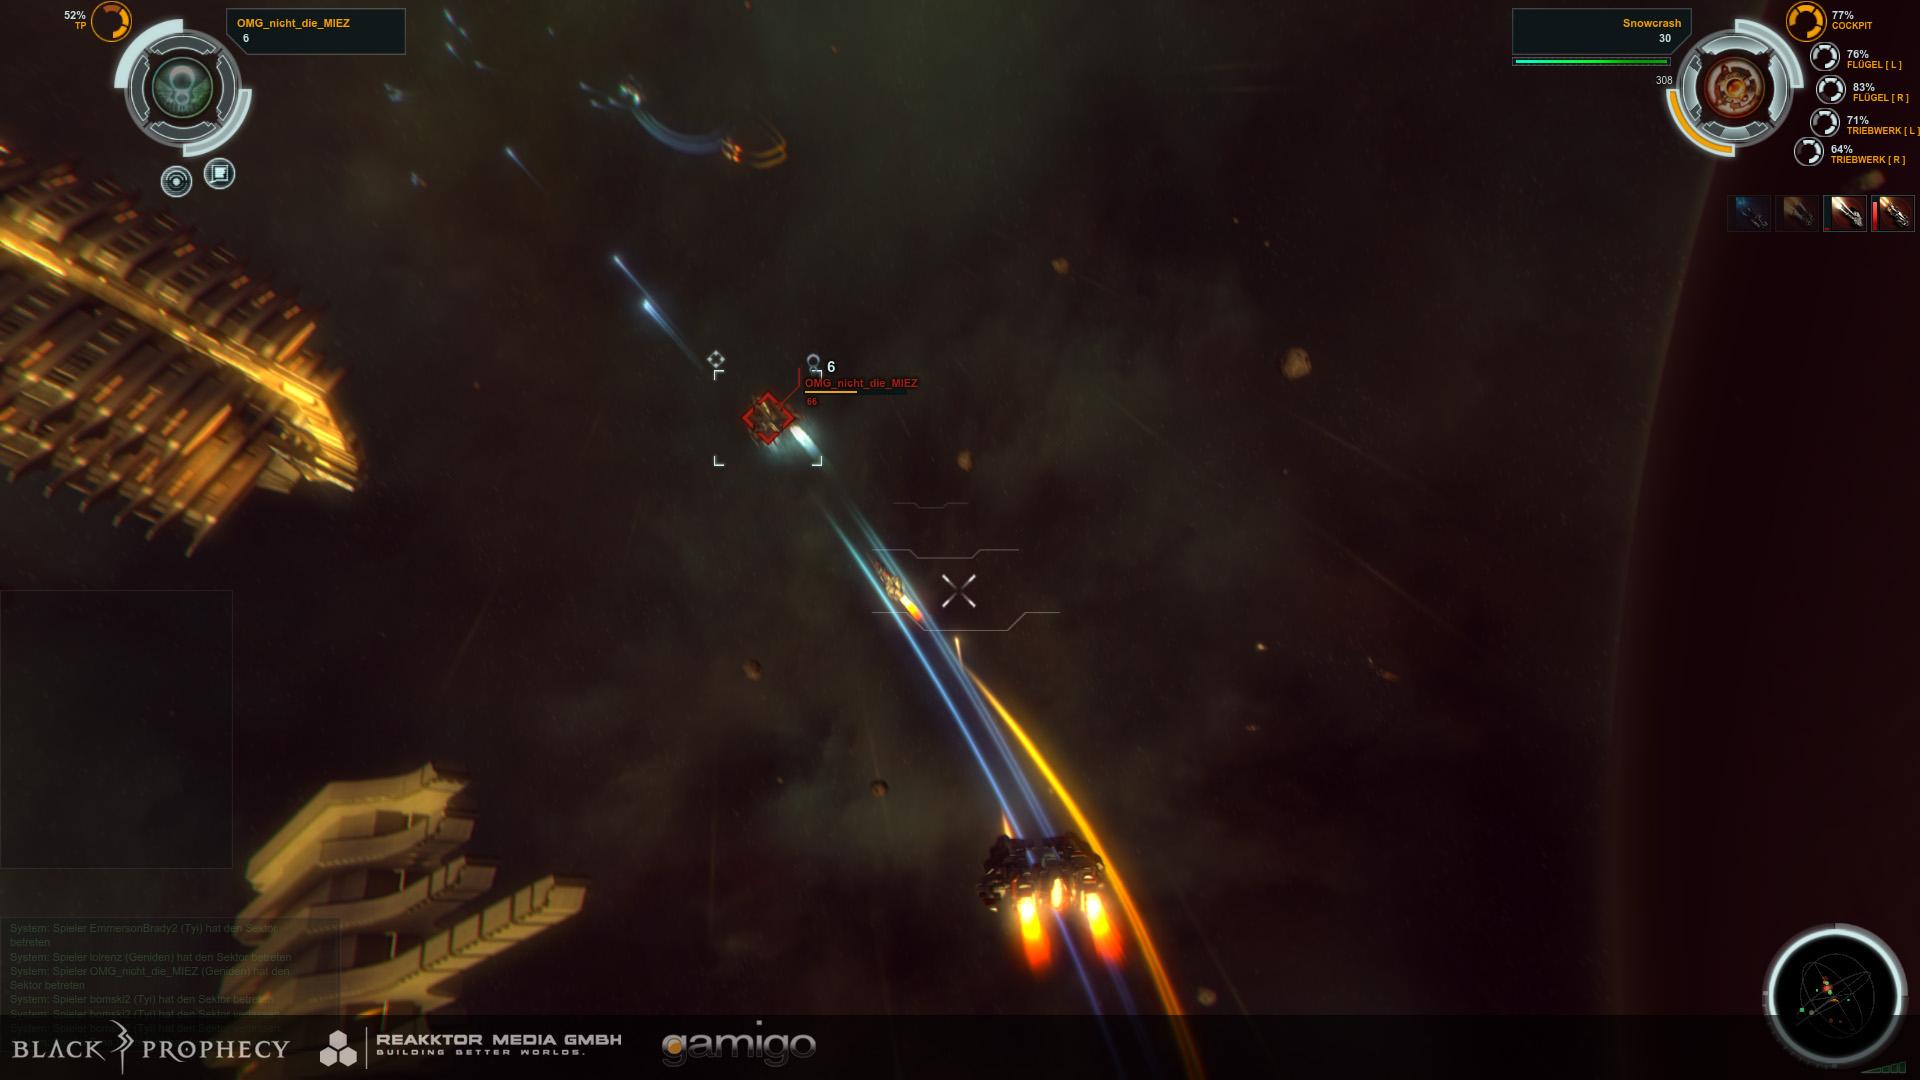 Скриншоты схватки между силами Tyi и Genide в секторе Apo Kata